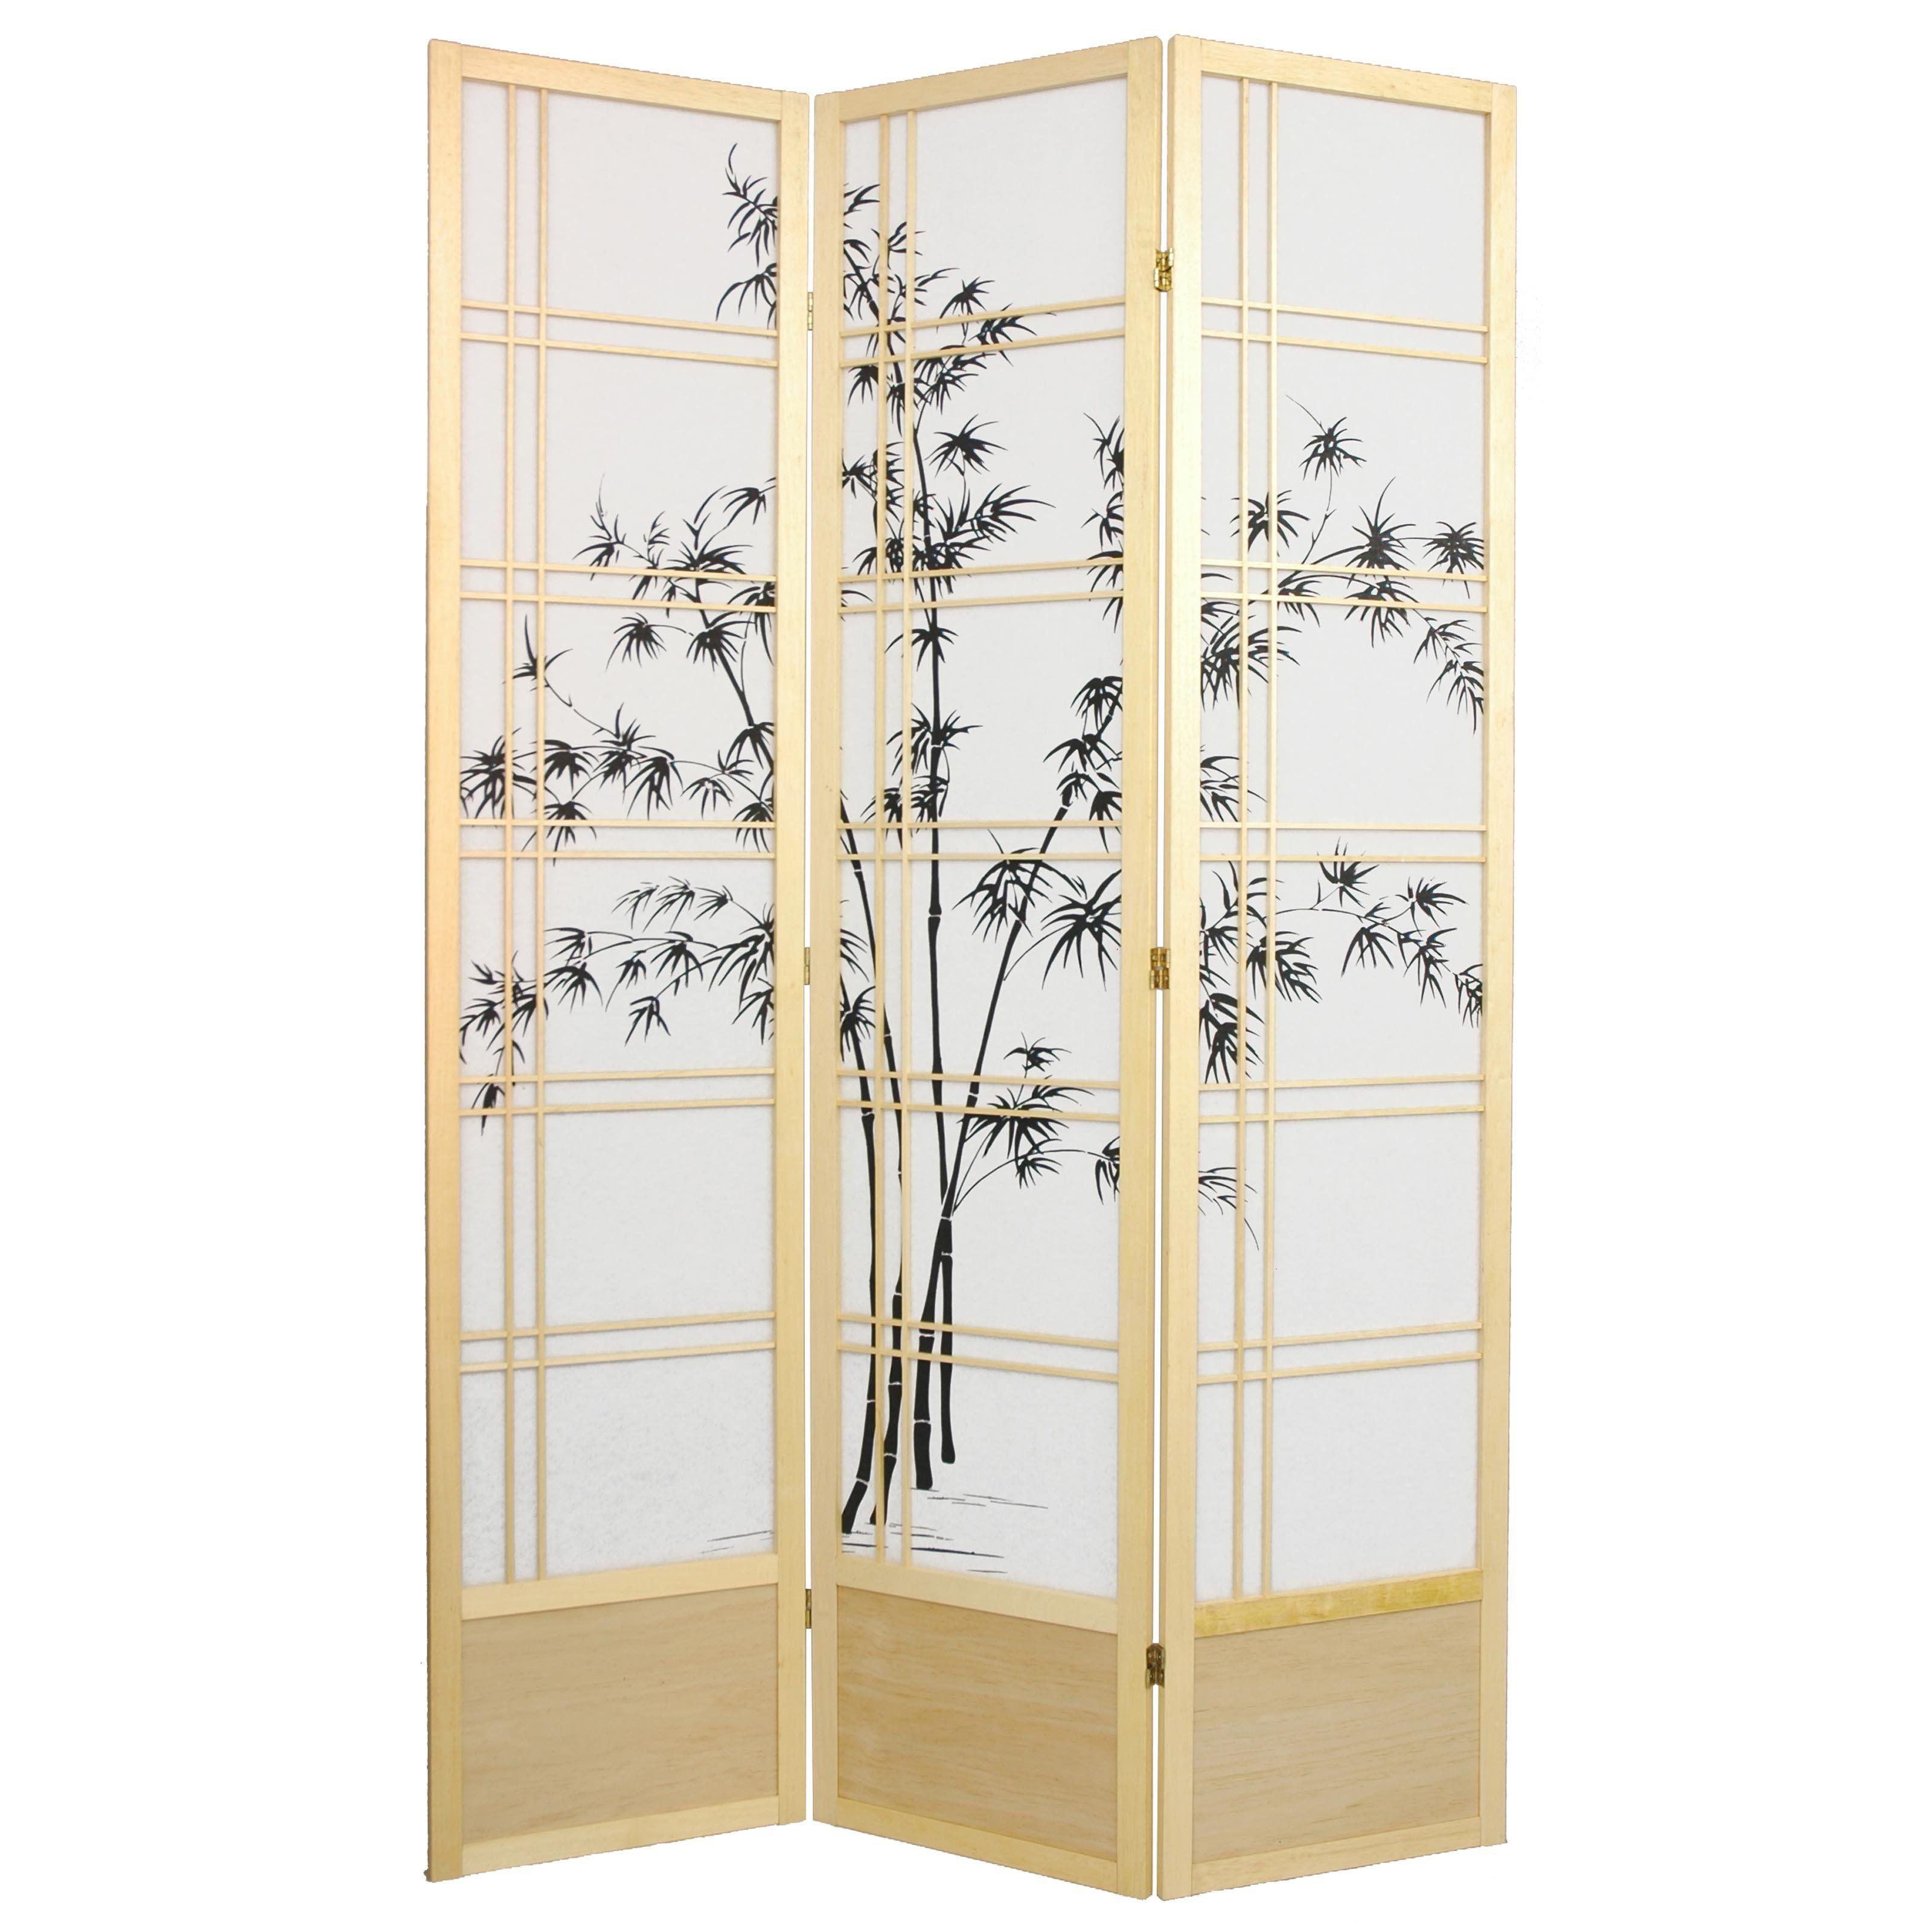 Oriental furniture bamboo tree inch shoji screen room divider